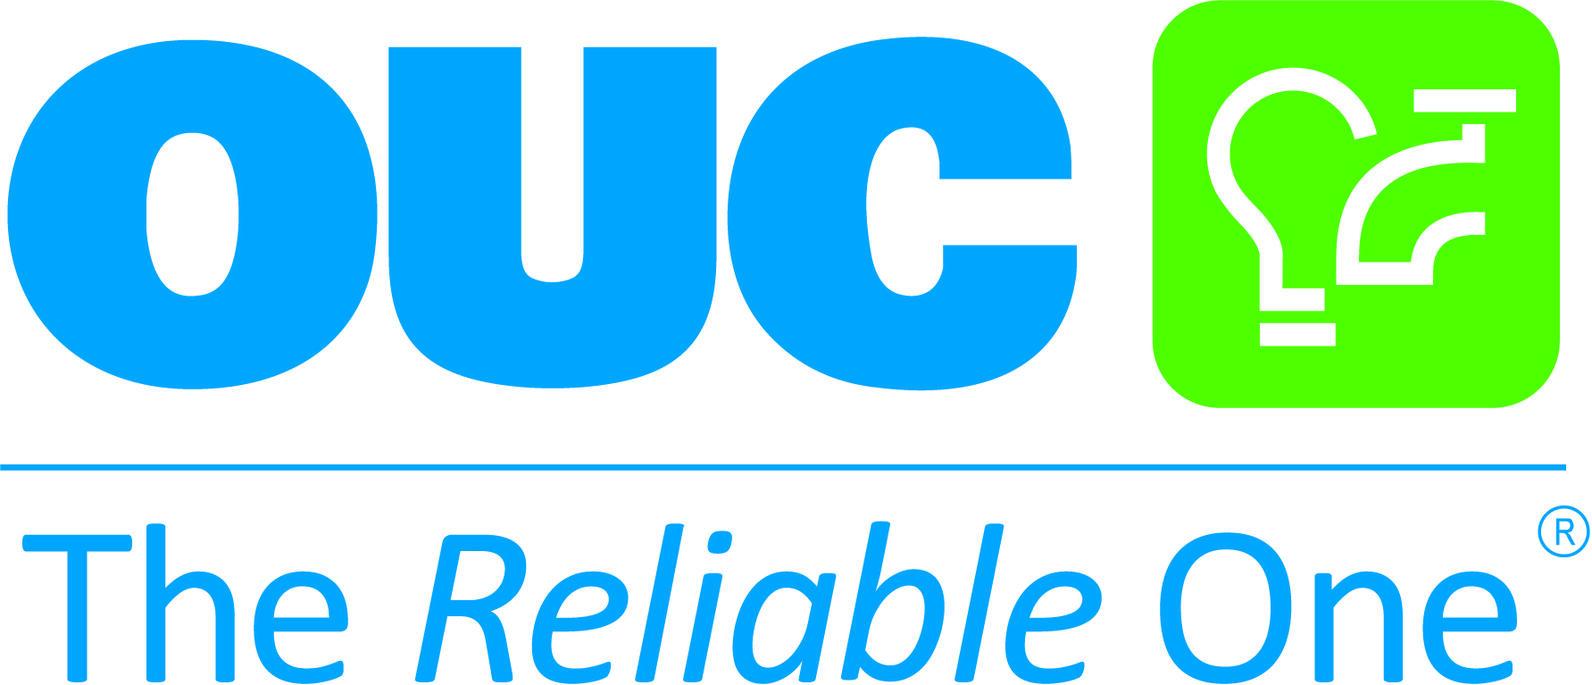 OUC, Orlando utilities commission logo